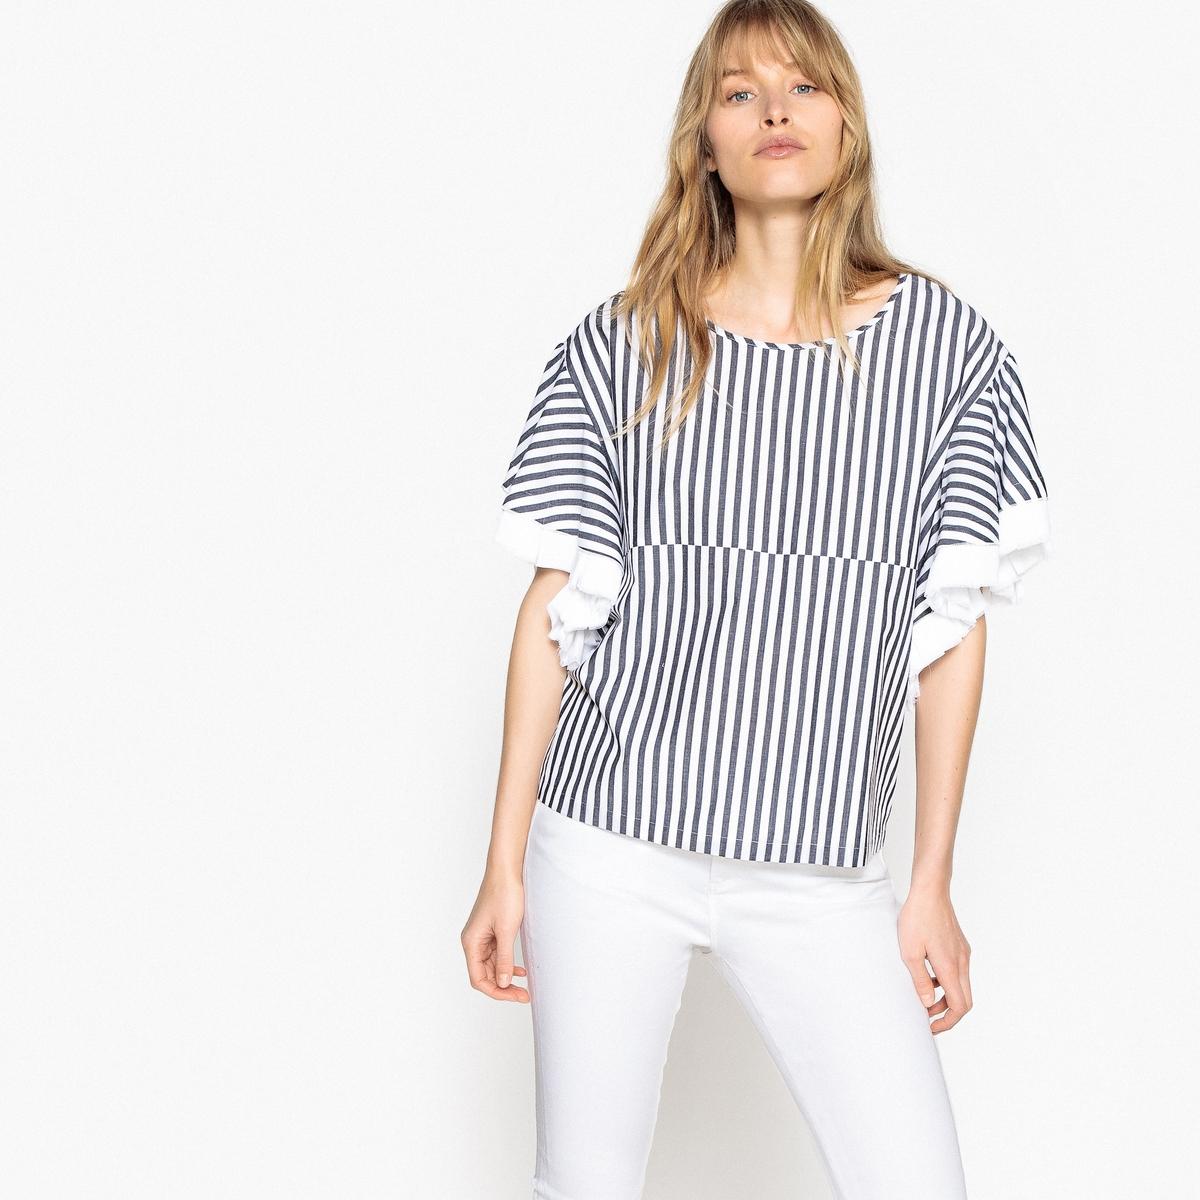 Блузка в полоску с корокими рукавами и завязками на талии